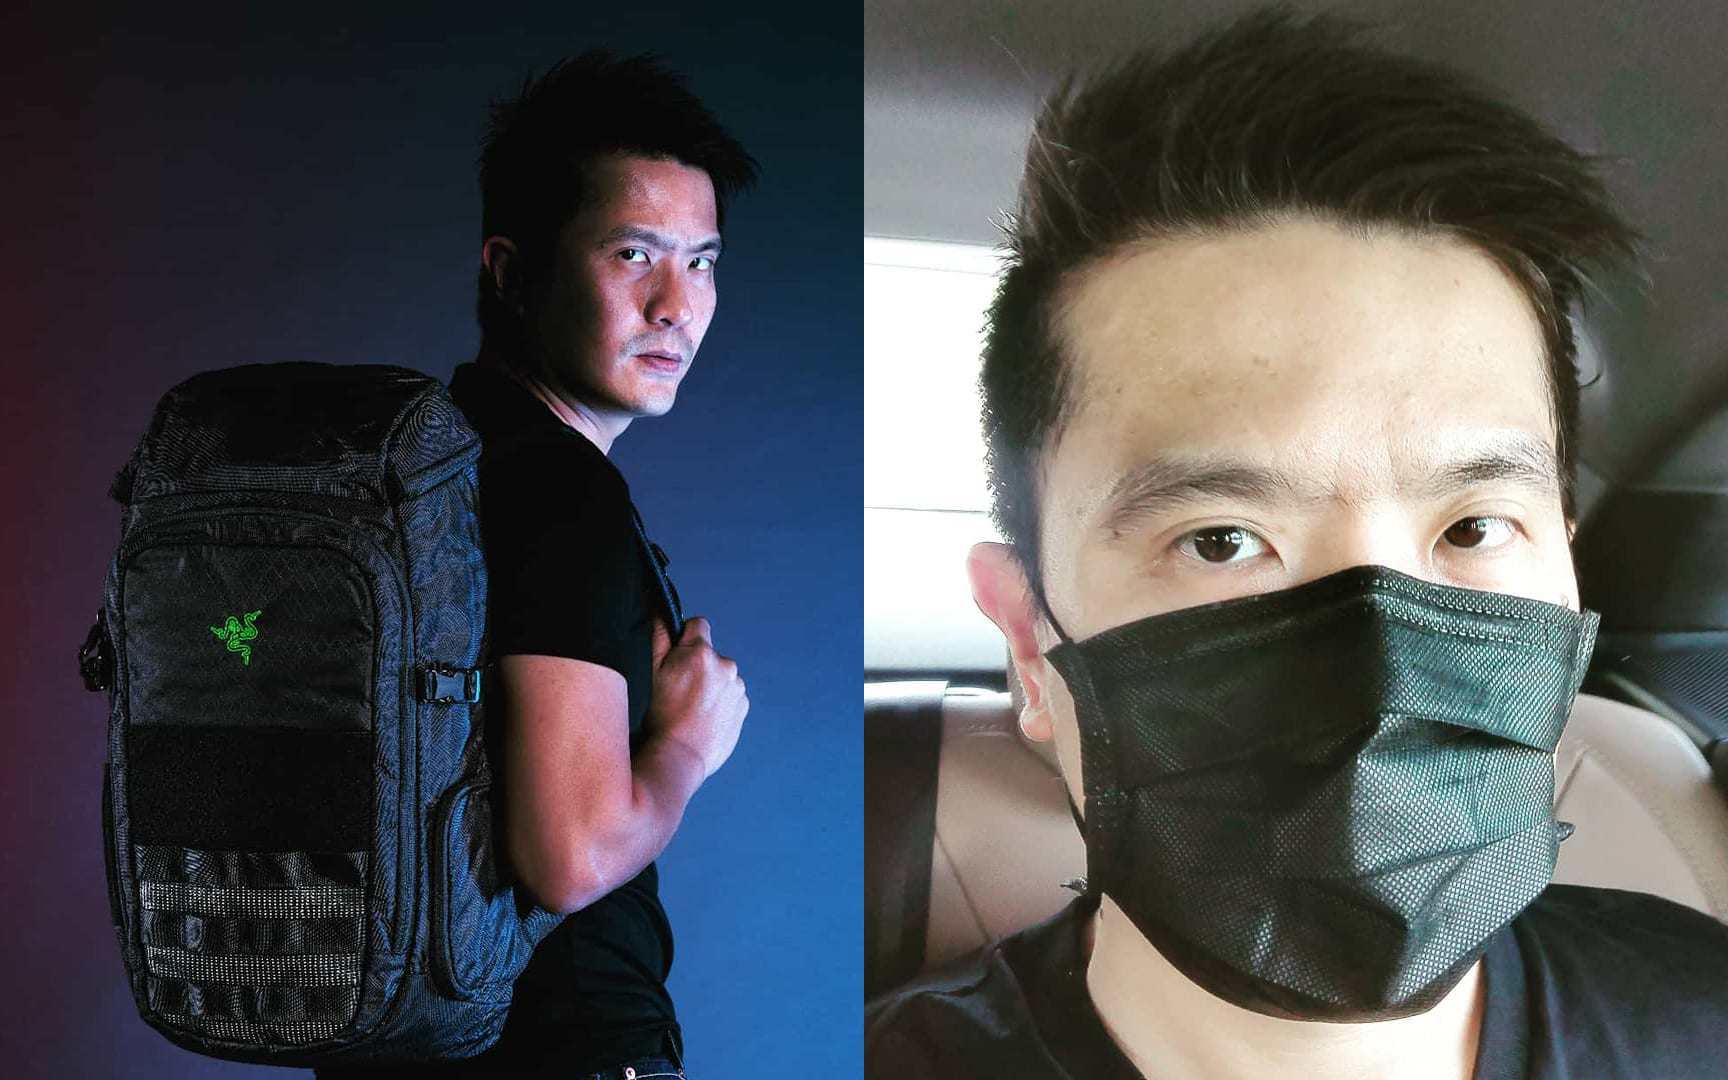 Razer CEO Min-liang Tan